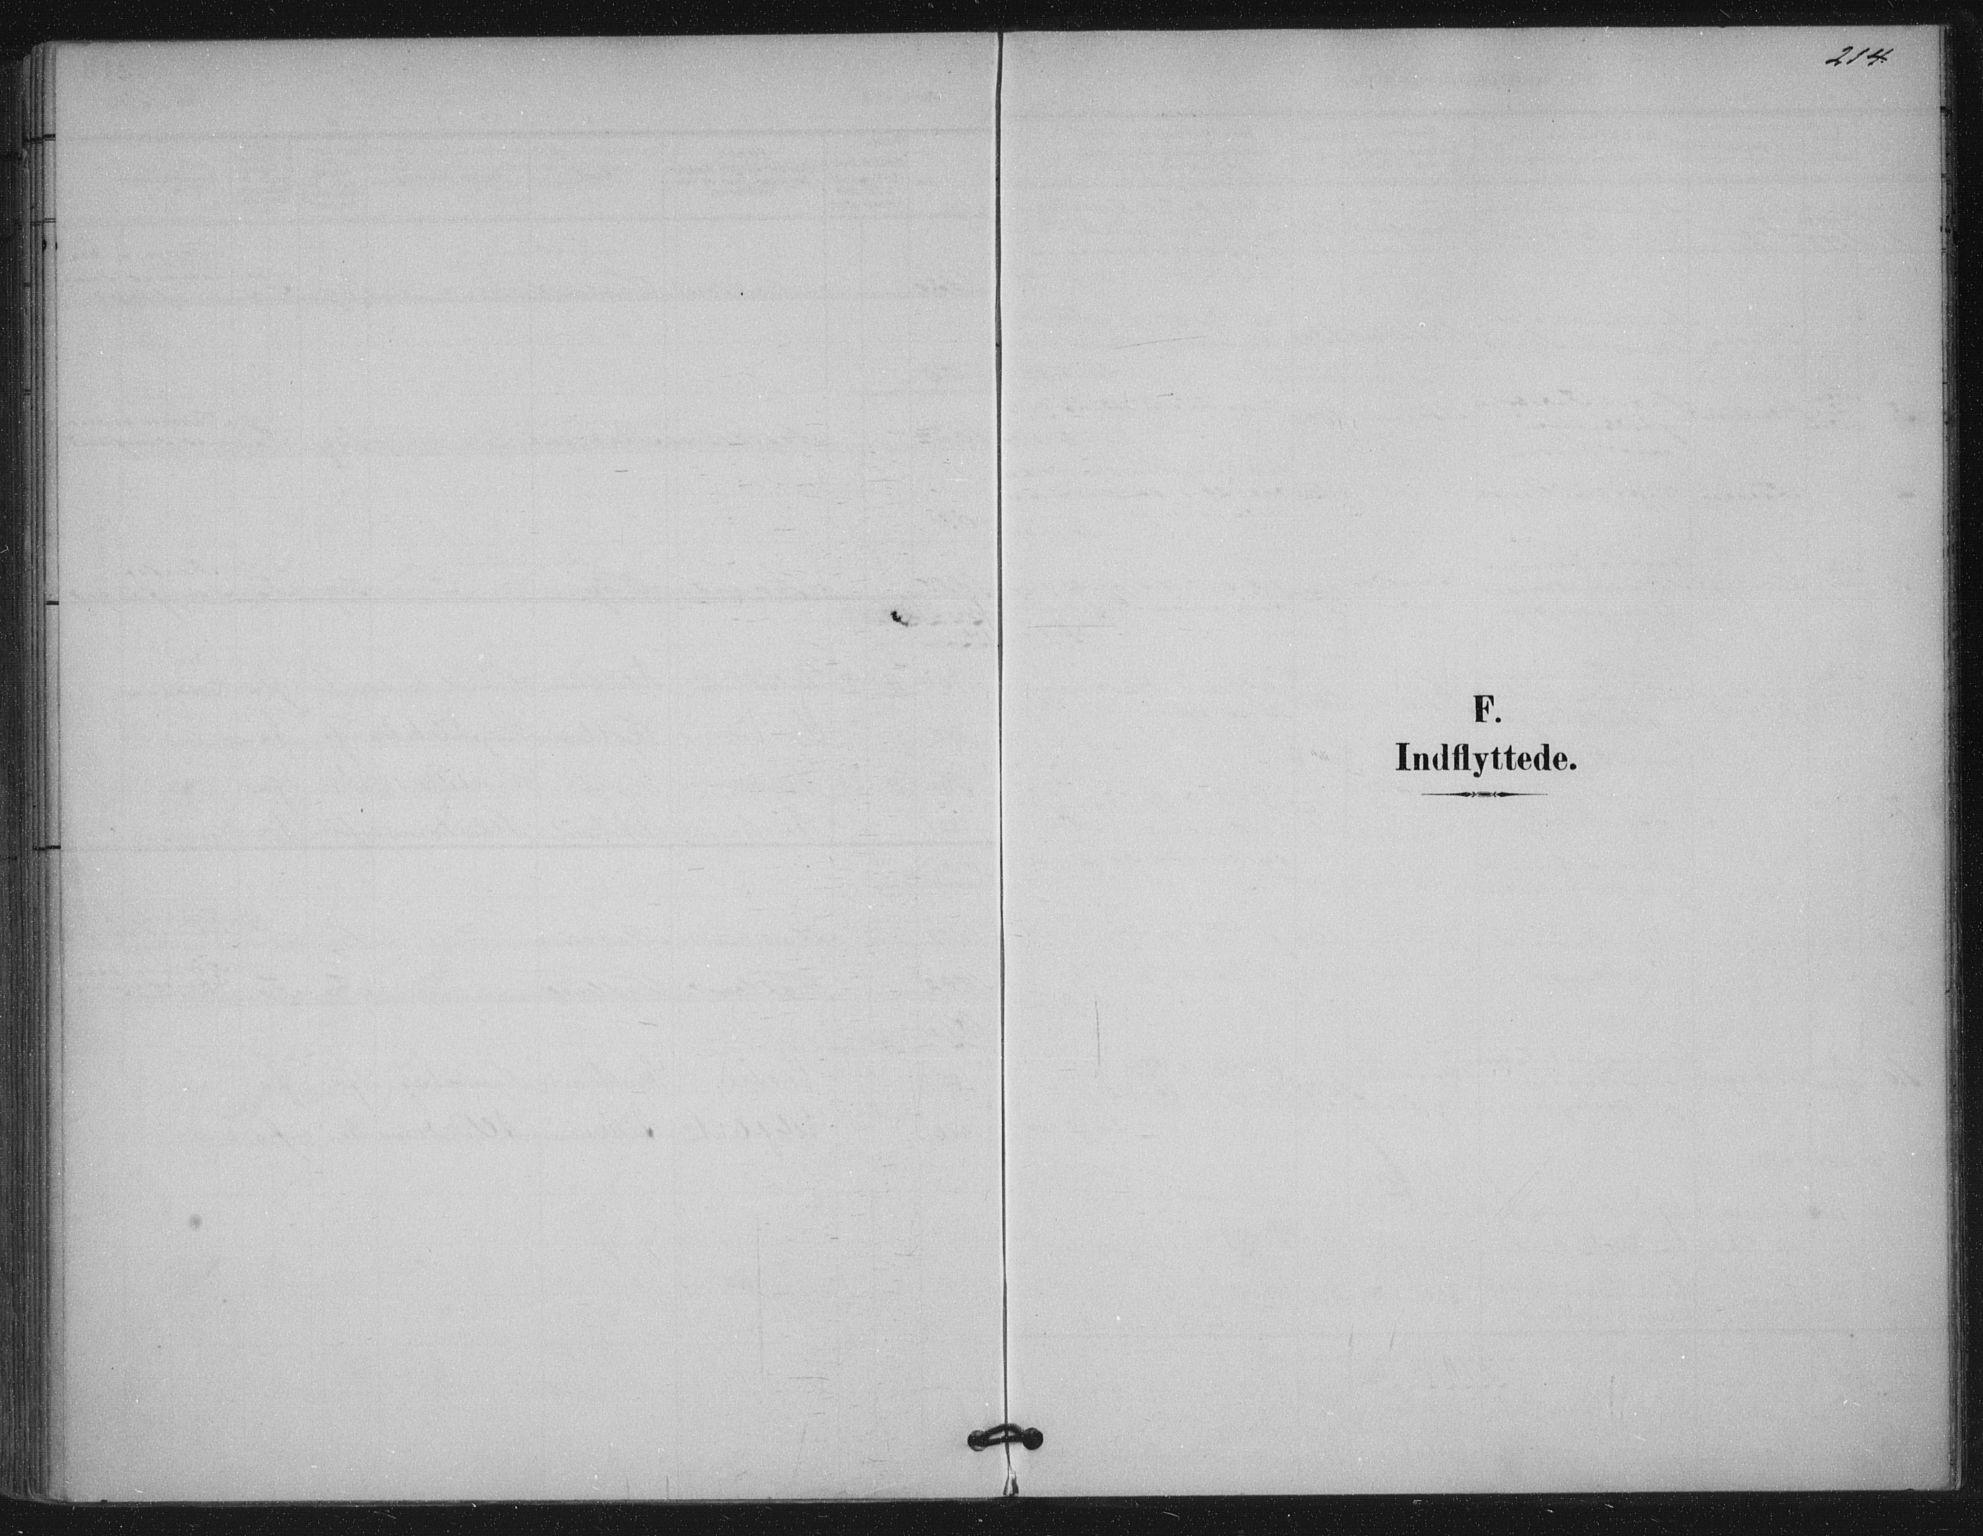 SAST, Skjold sokneprestkontor, H/Ha/Haa/L0011: Ministerialbok nr. A 11, 1897-1914, s. 214